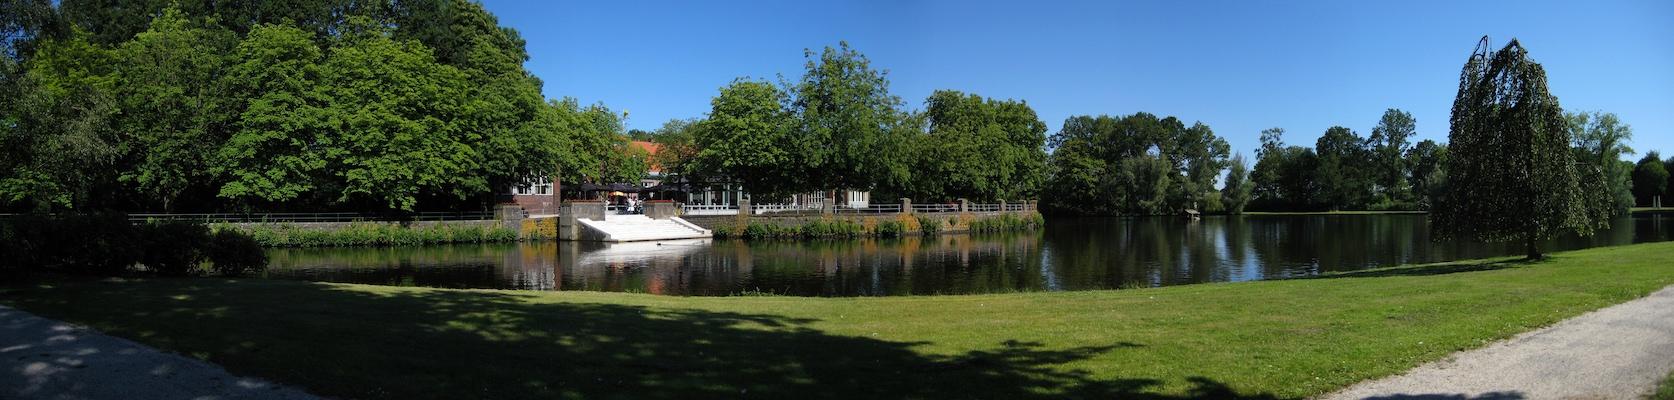 Groningen - Stadsparkpaviljoen